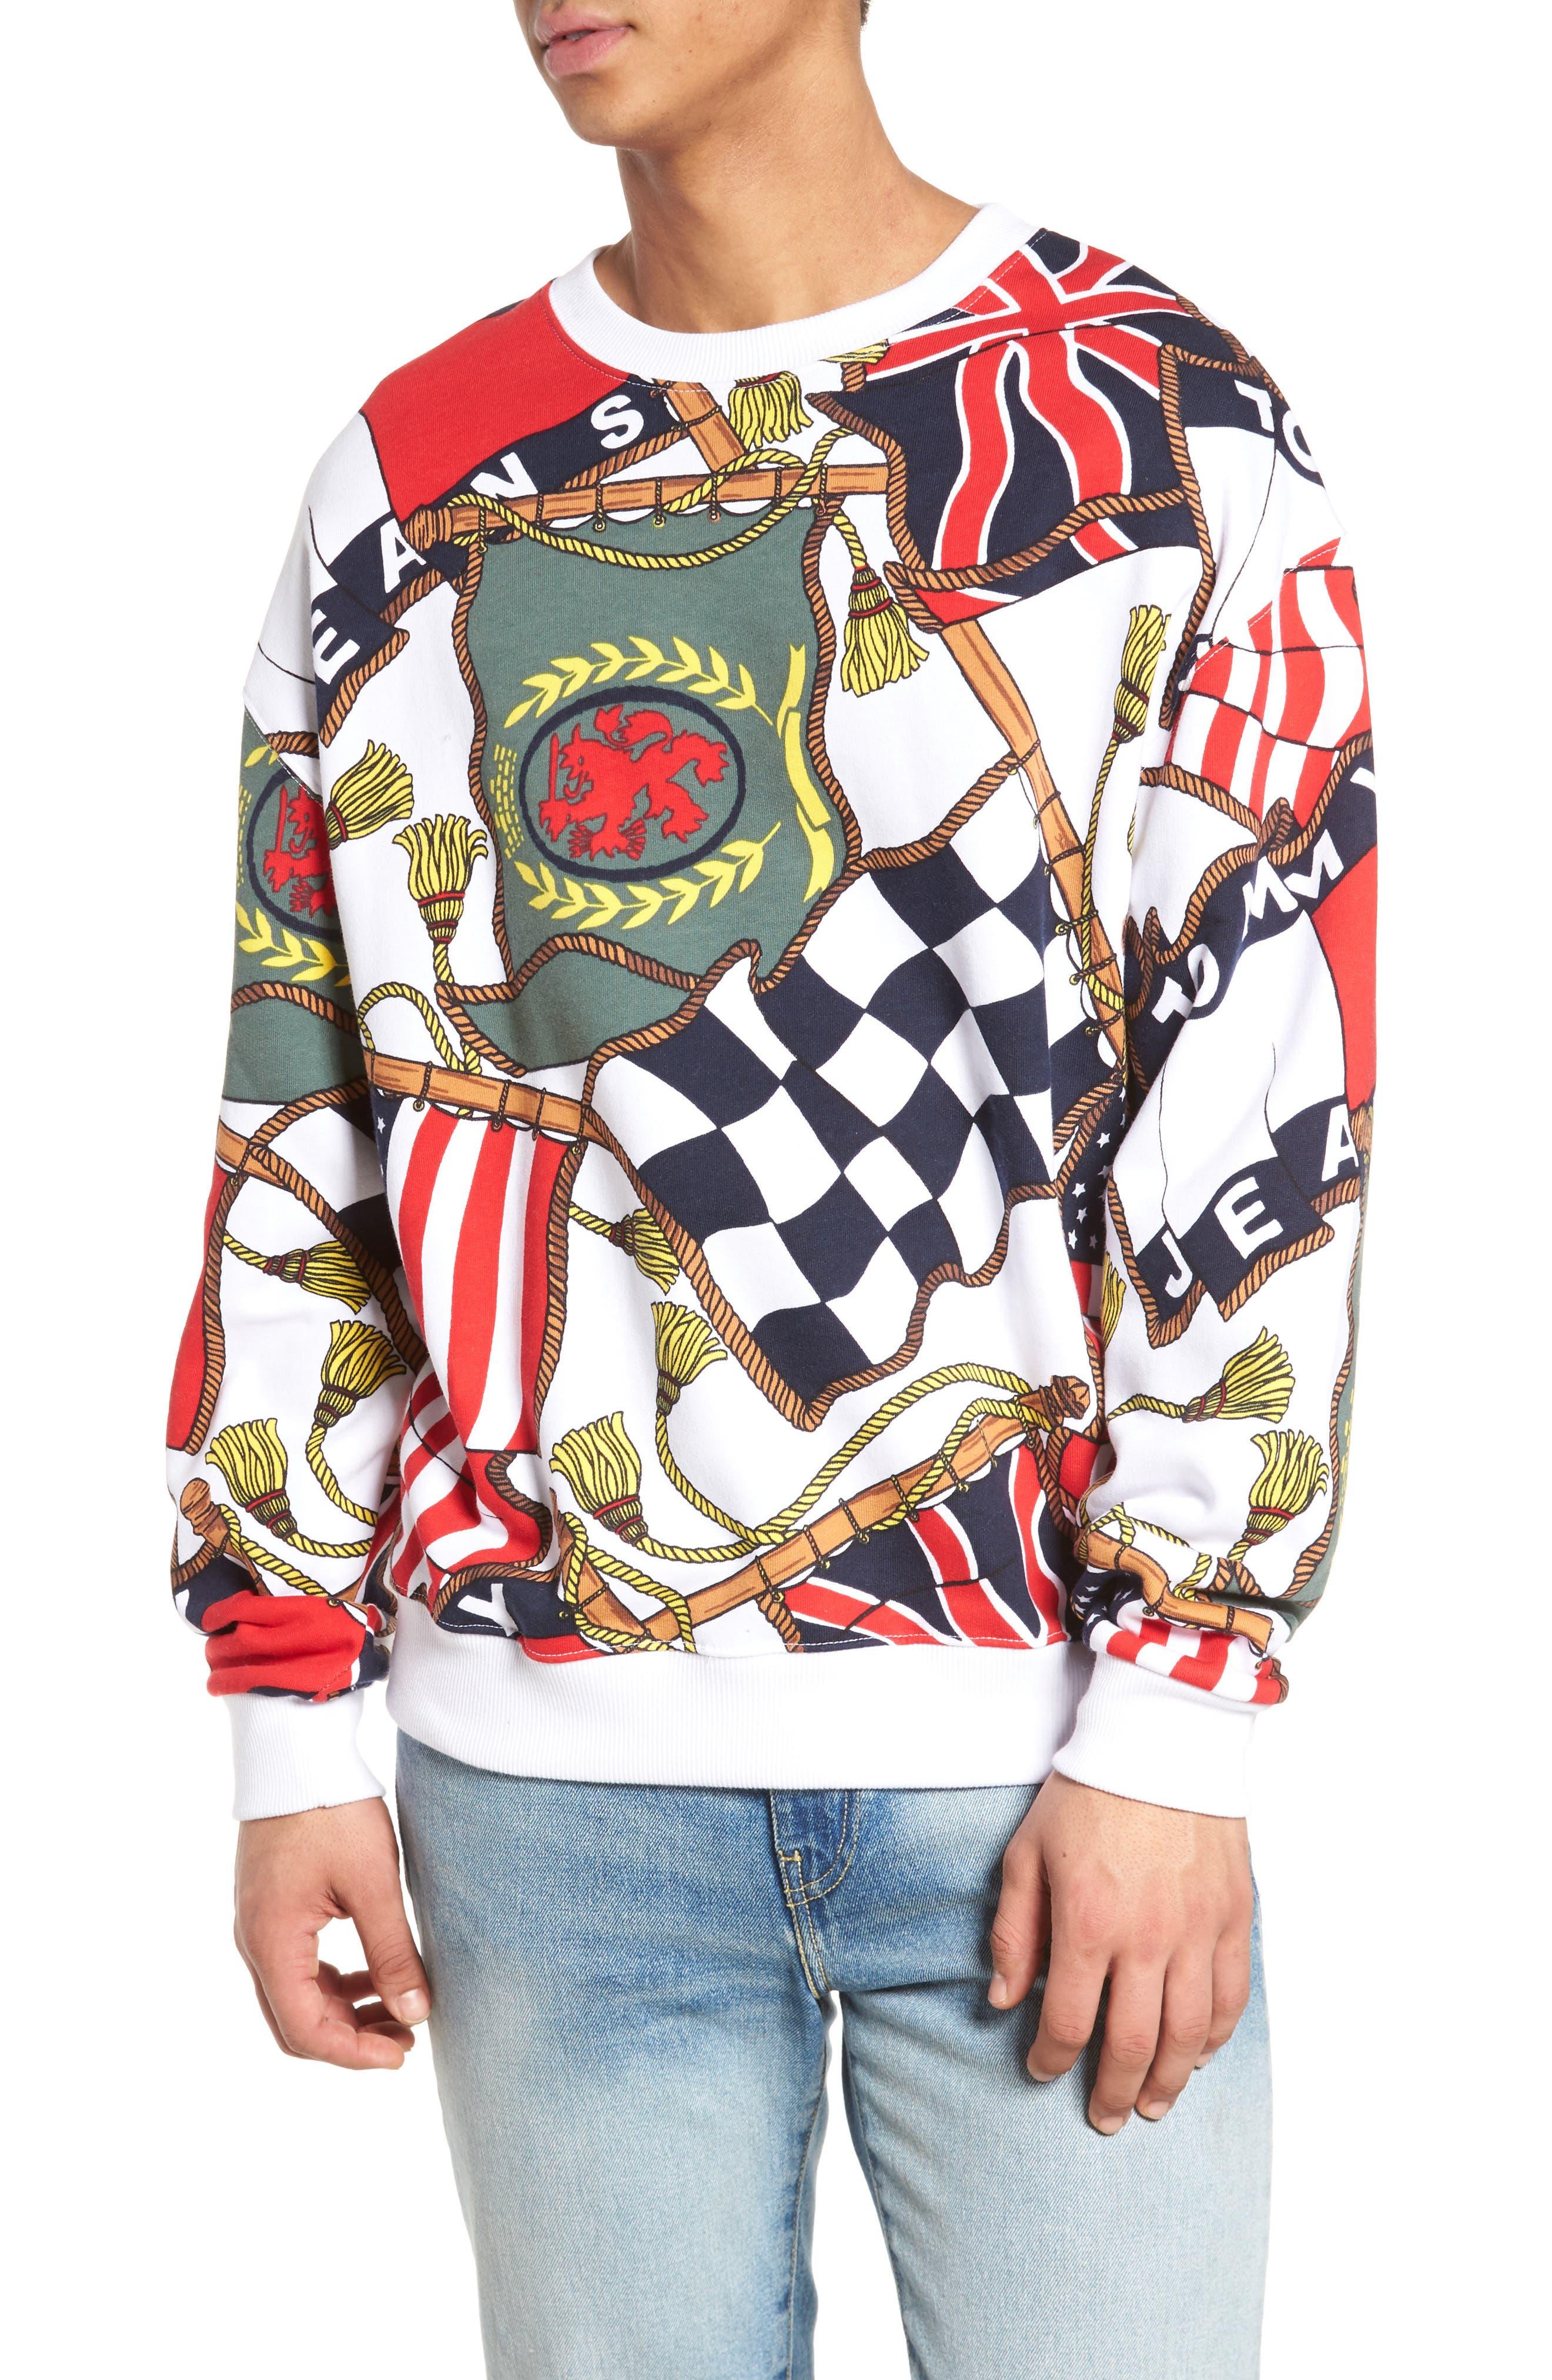 TOMMY HILFIGER,                             90s Sweatshirt,                             Main thumbnail 1, color,                             101